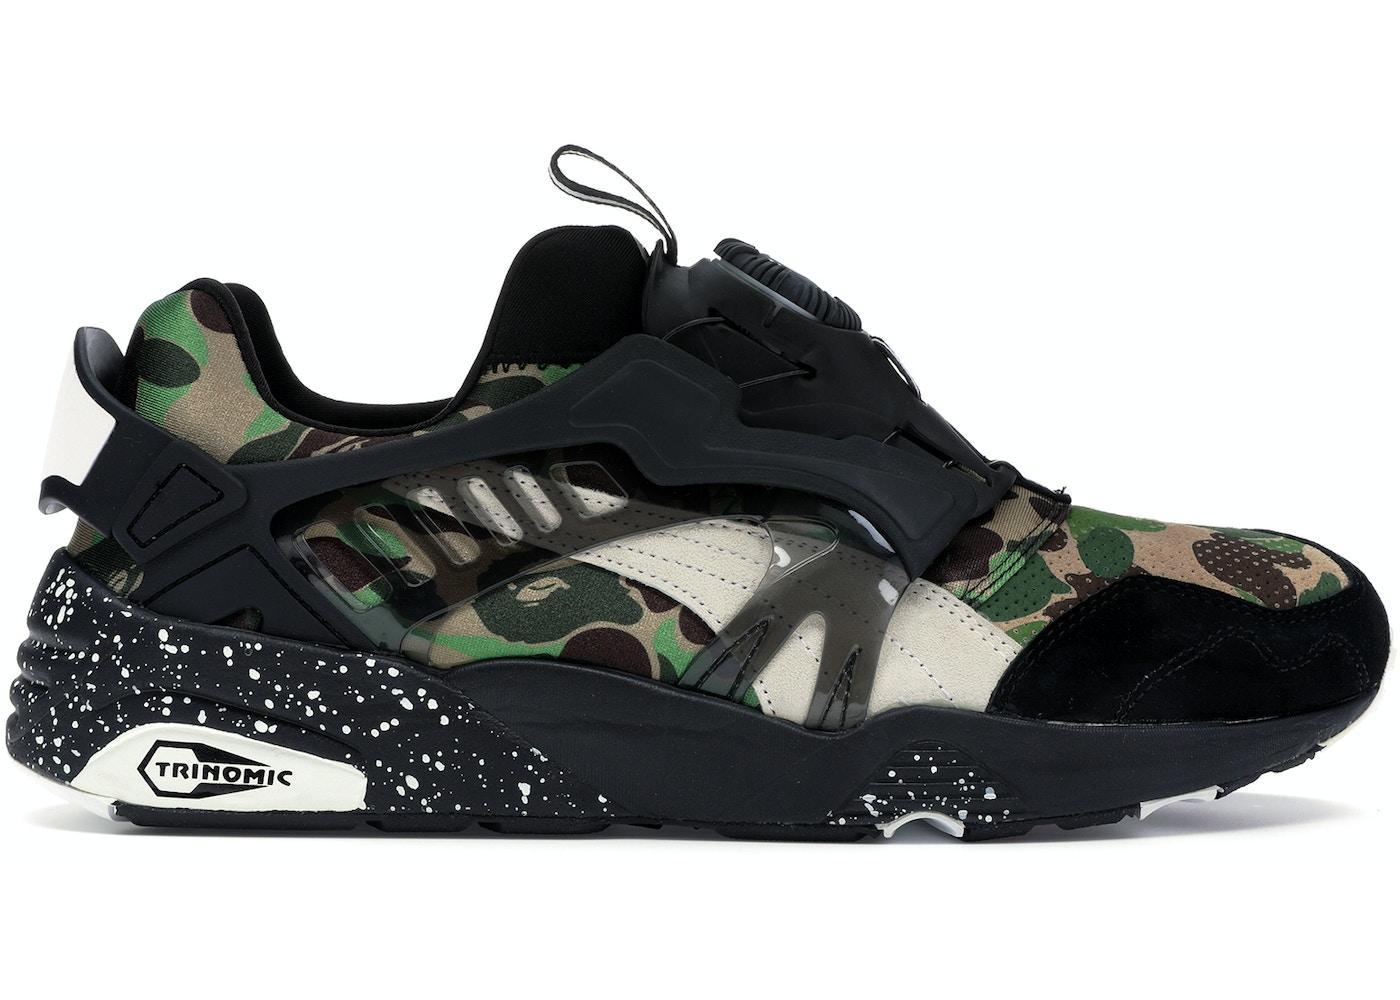 huge selection of 5a68b 7289f Footwear - Buy Deadstock Sneakers